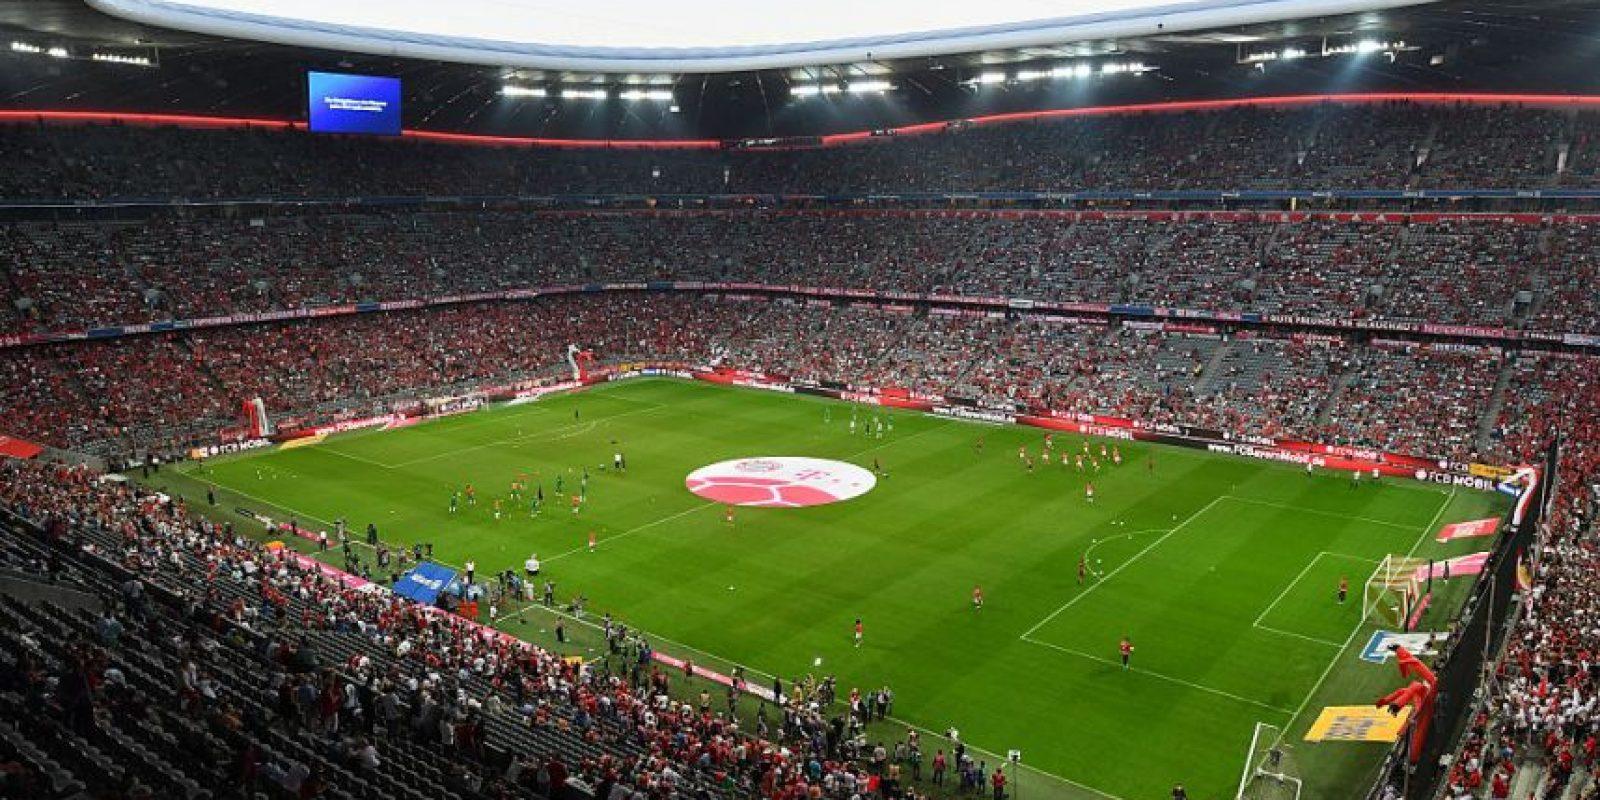 6.Bayern Munich – Allianz Arena (89.8 millones) Foto:Getty Images